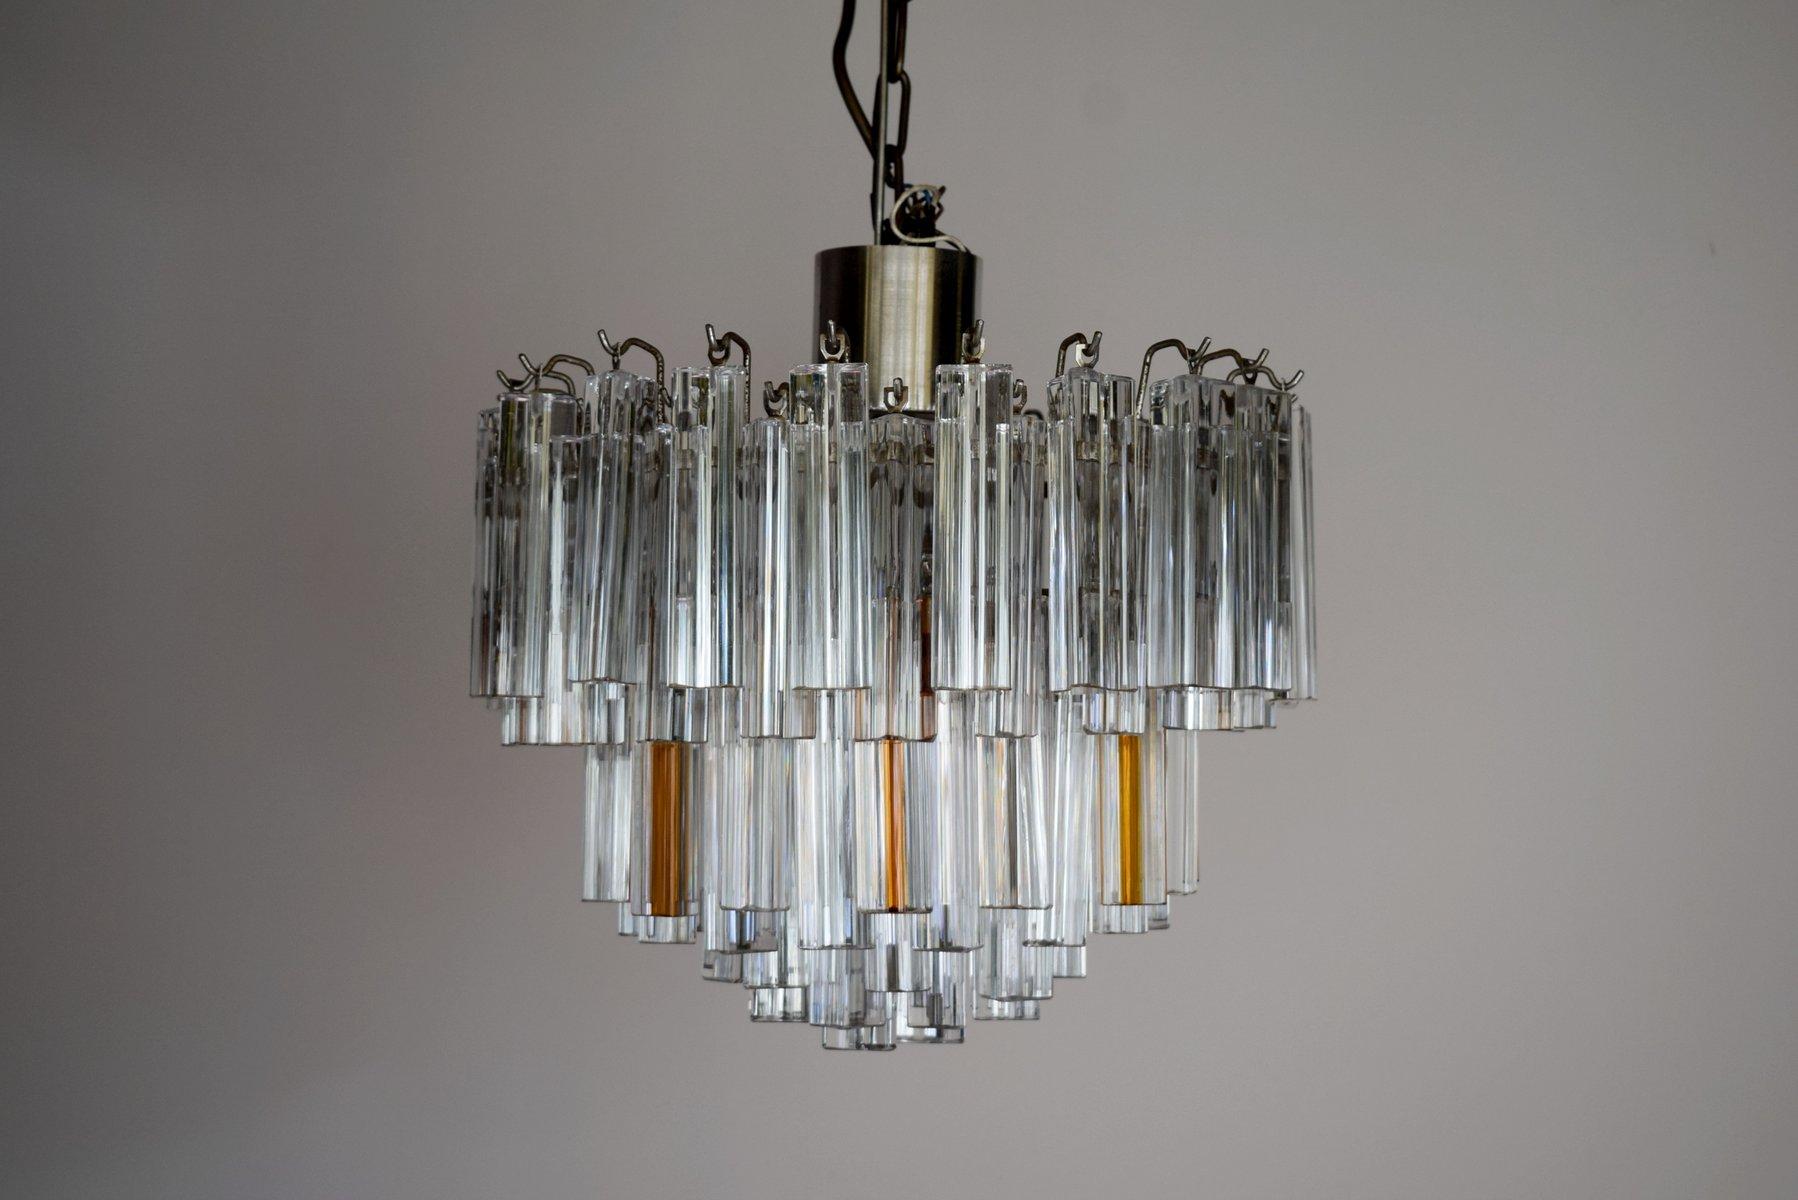 chandelier mid century moderne en verre transparent et ambr en vente sur pamono. Black Bedroom Furniture Sets. Home Design Ideas